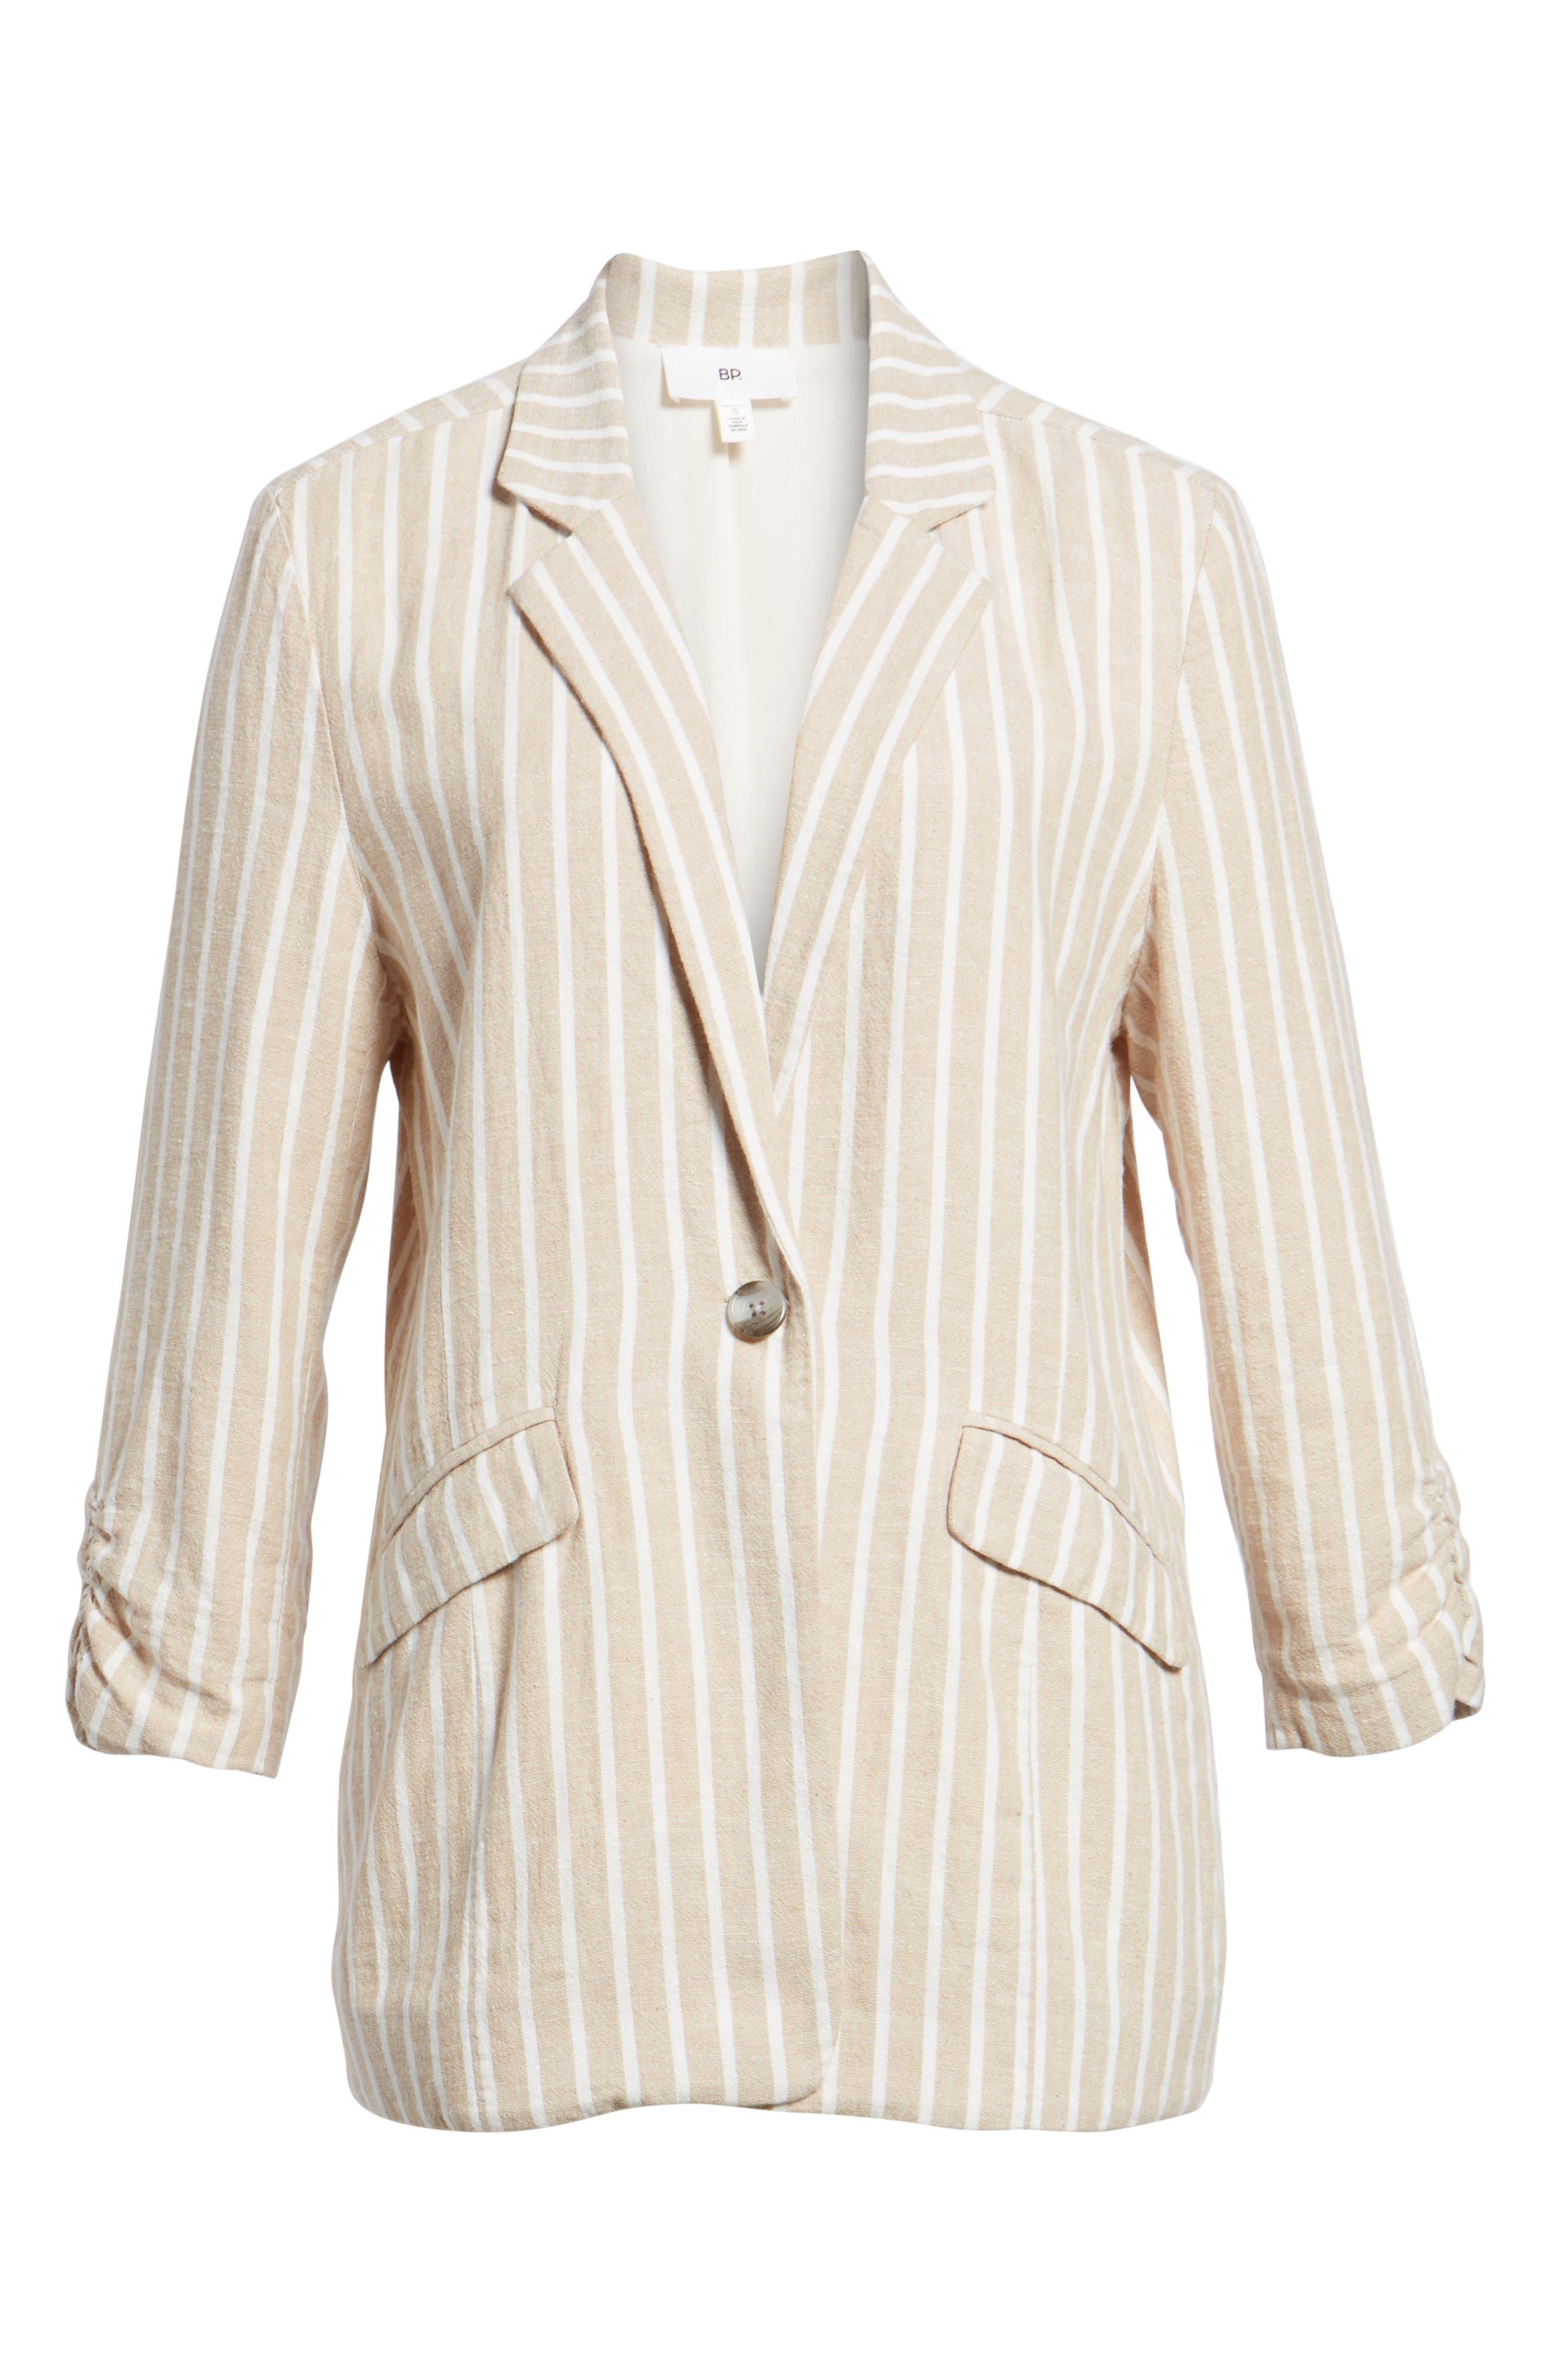 Cinch Sleeve Blazer,                             Alternate thumbnail 6, color,                             Tan Nomad Ella Linen Stripe